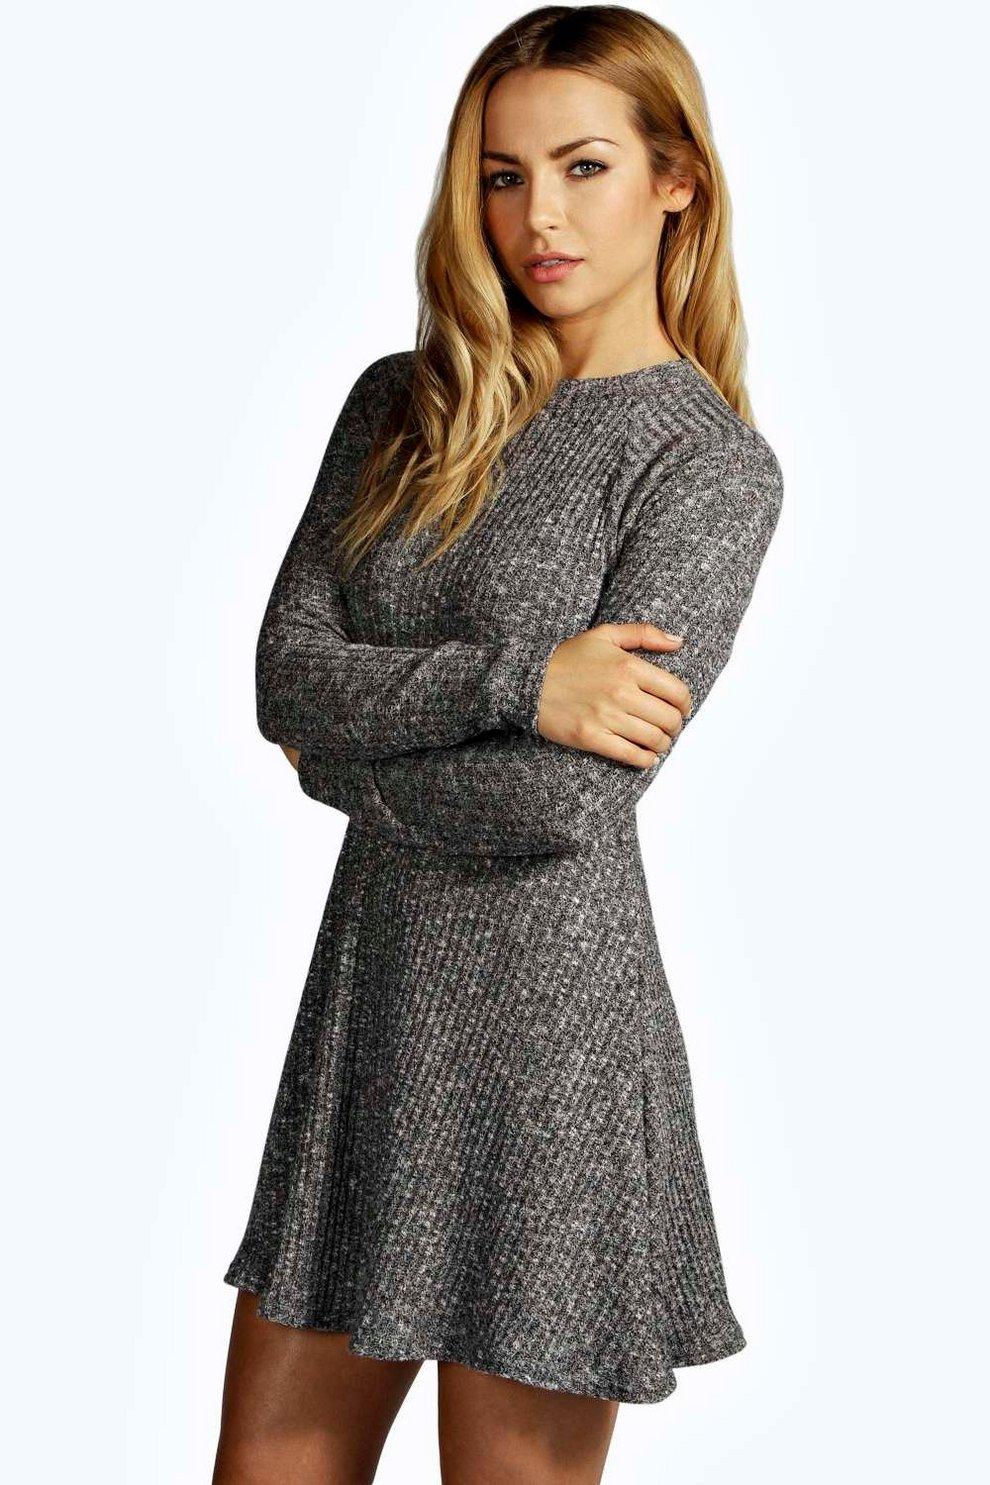 Womens Rib Jumper Dress Boohoo Petite Sale View Brand New Unisex For Sale Deals yj1lKgf